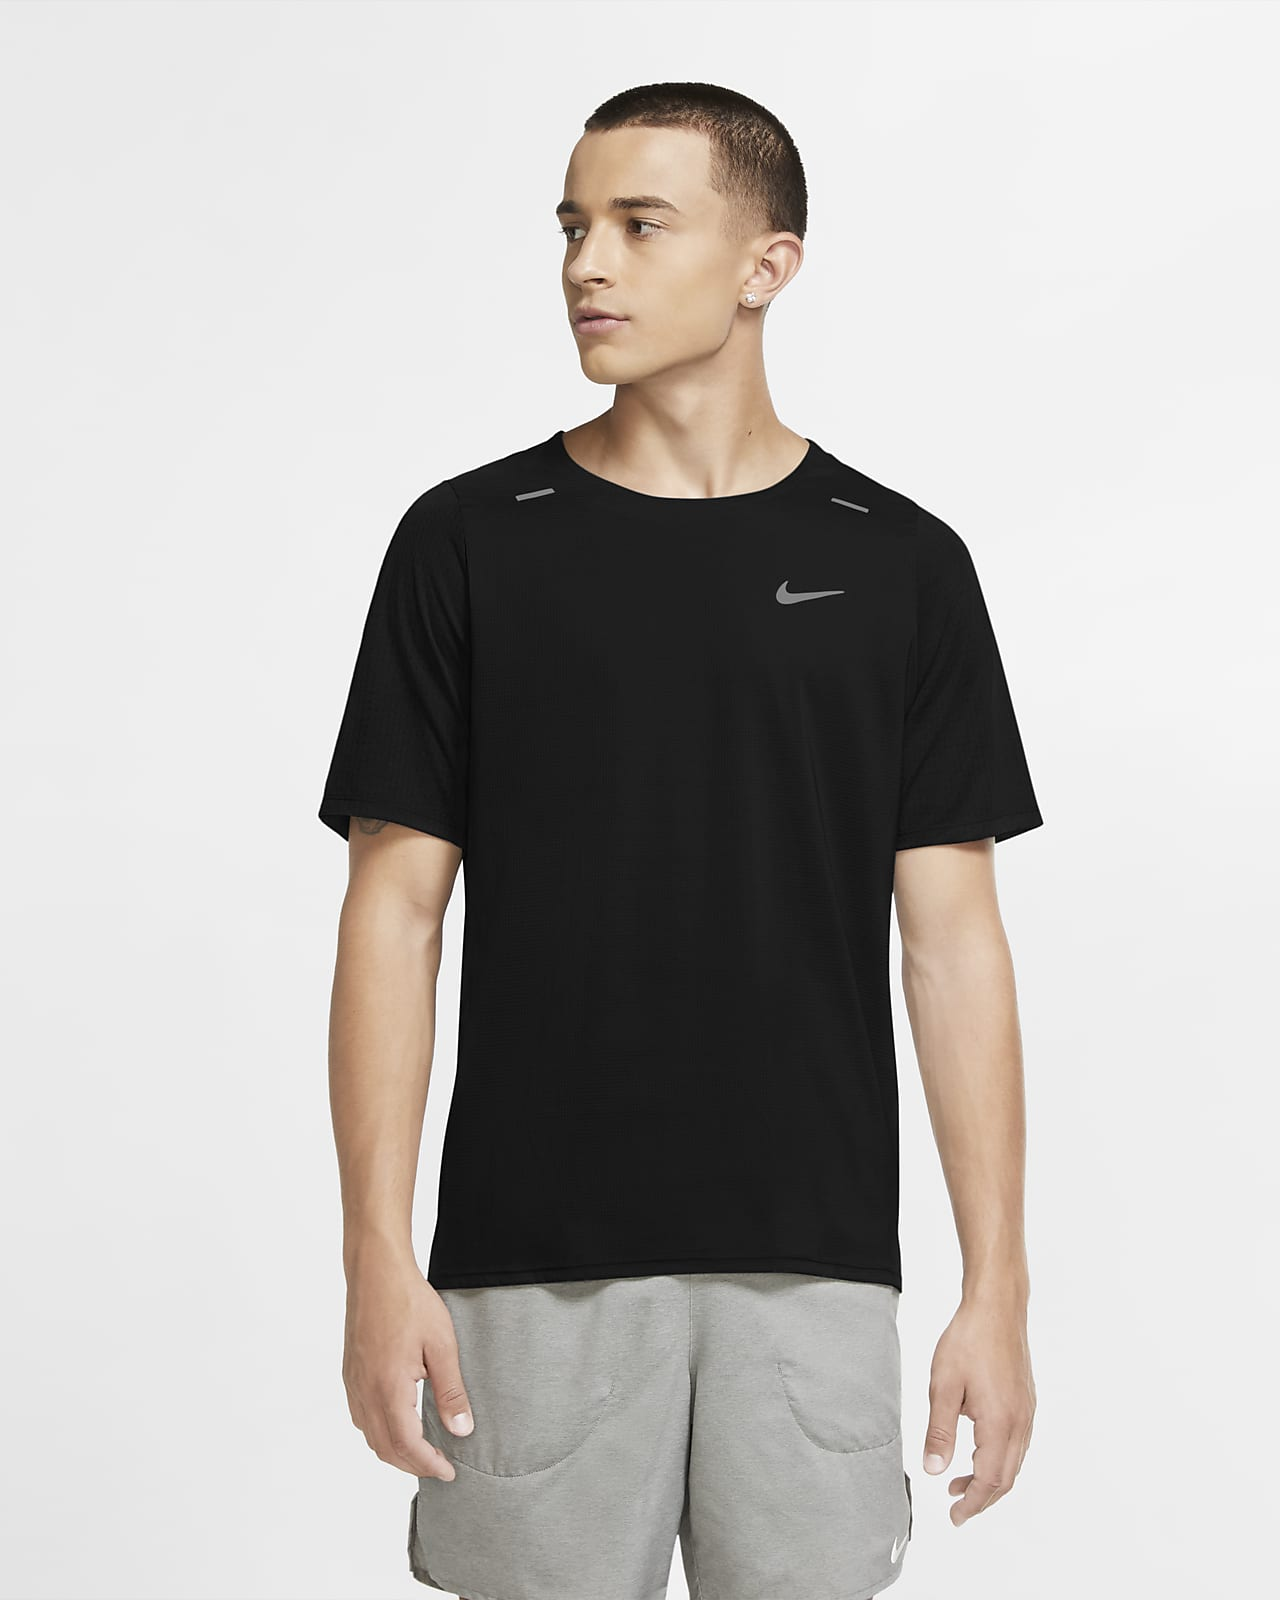 Haut de running hybride Nike Breathe Rise 365 pour Homme